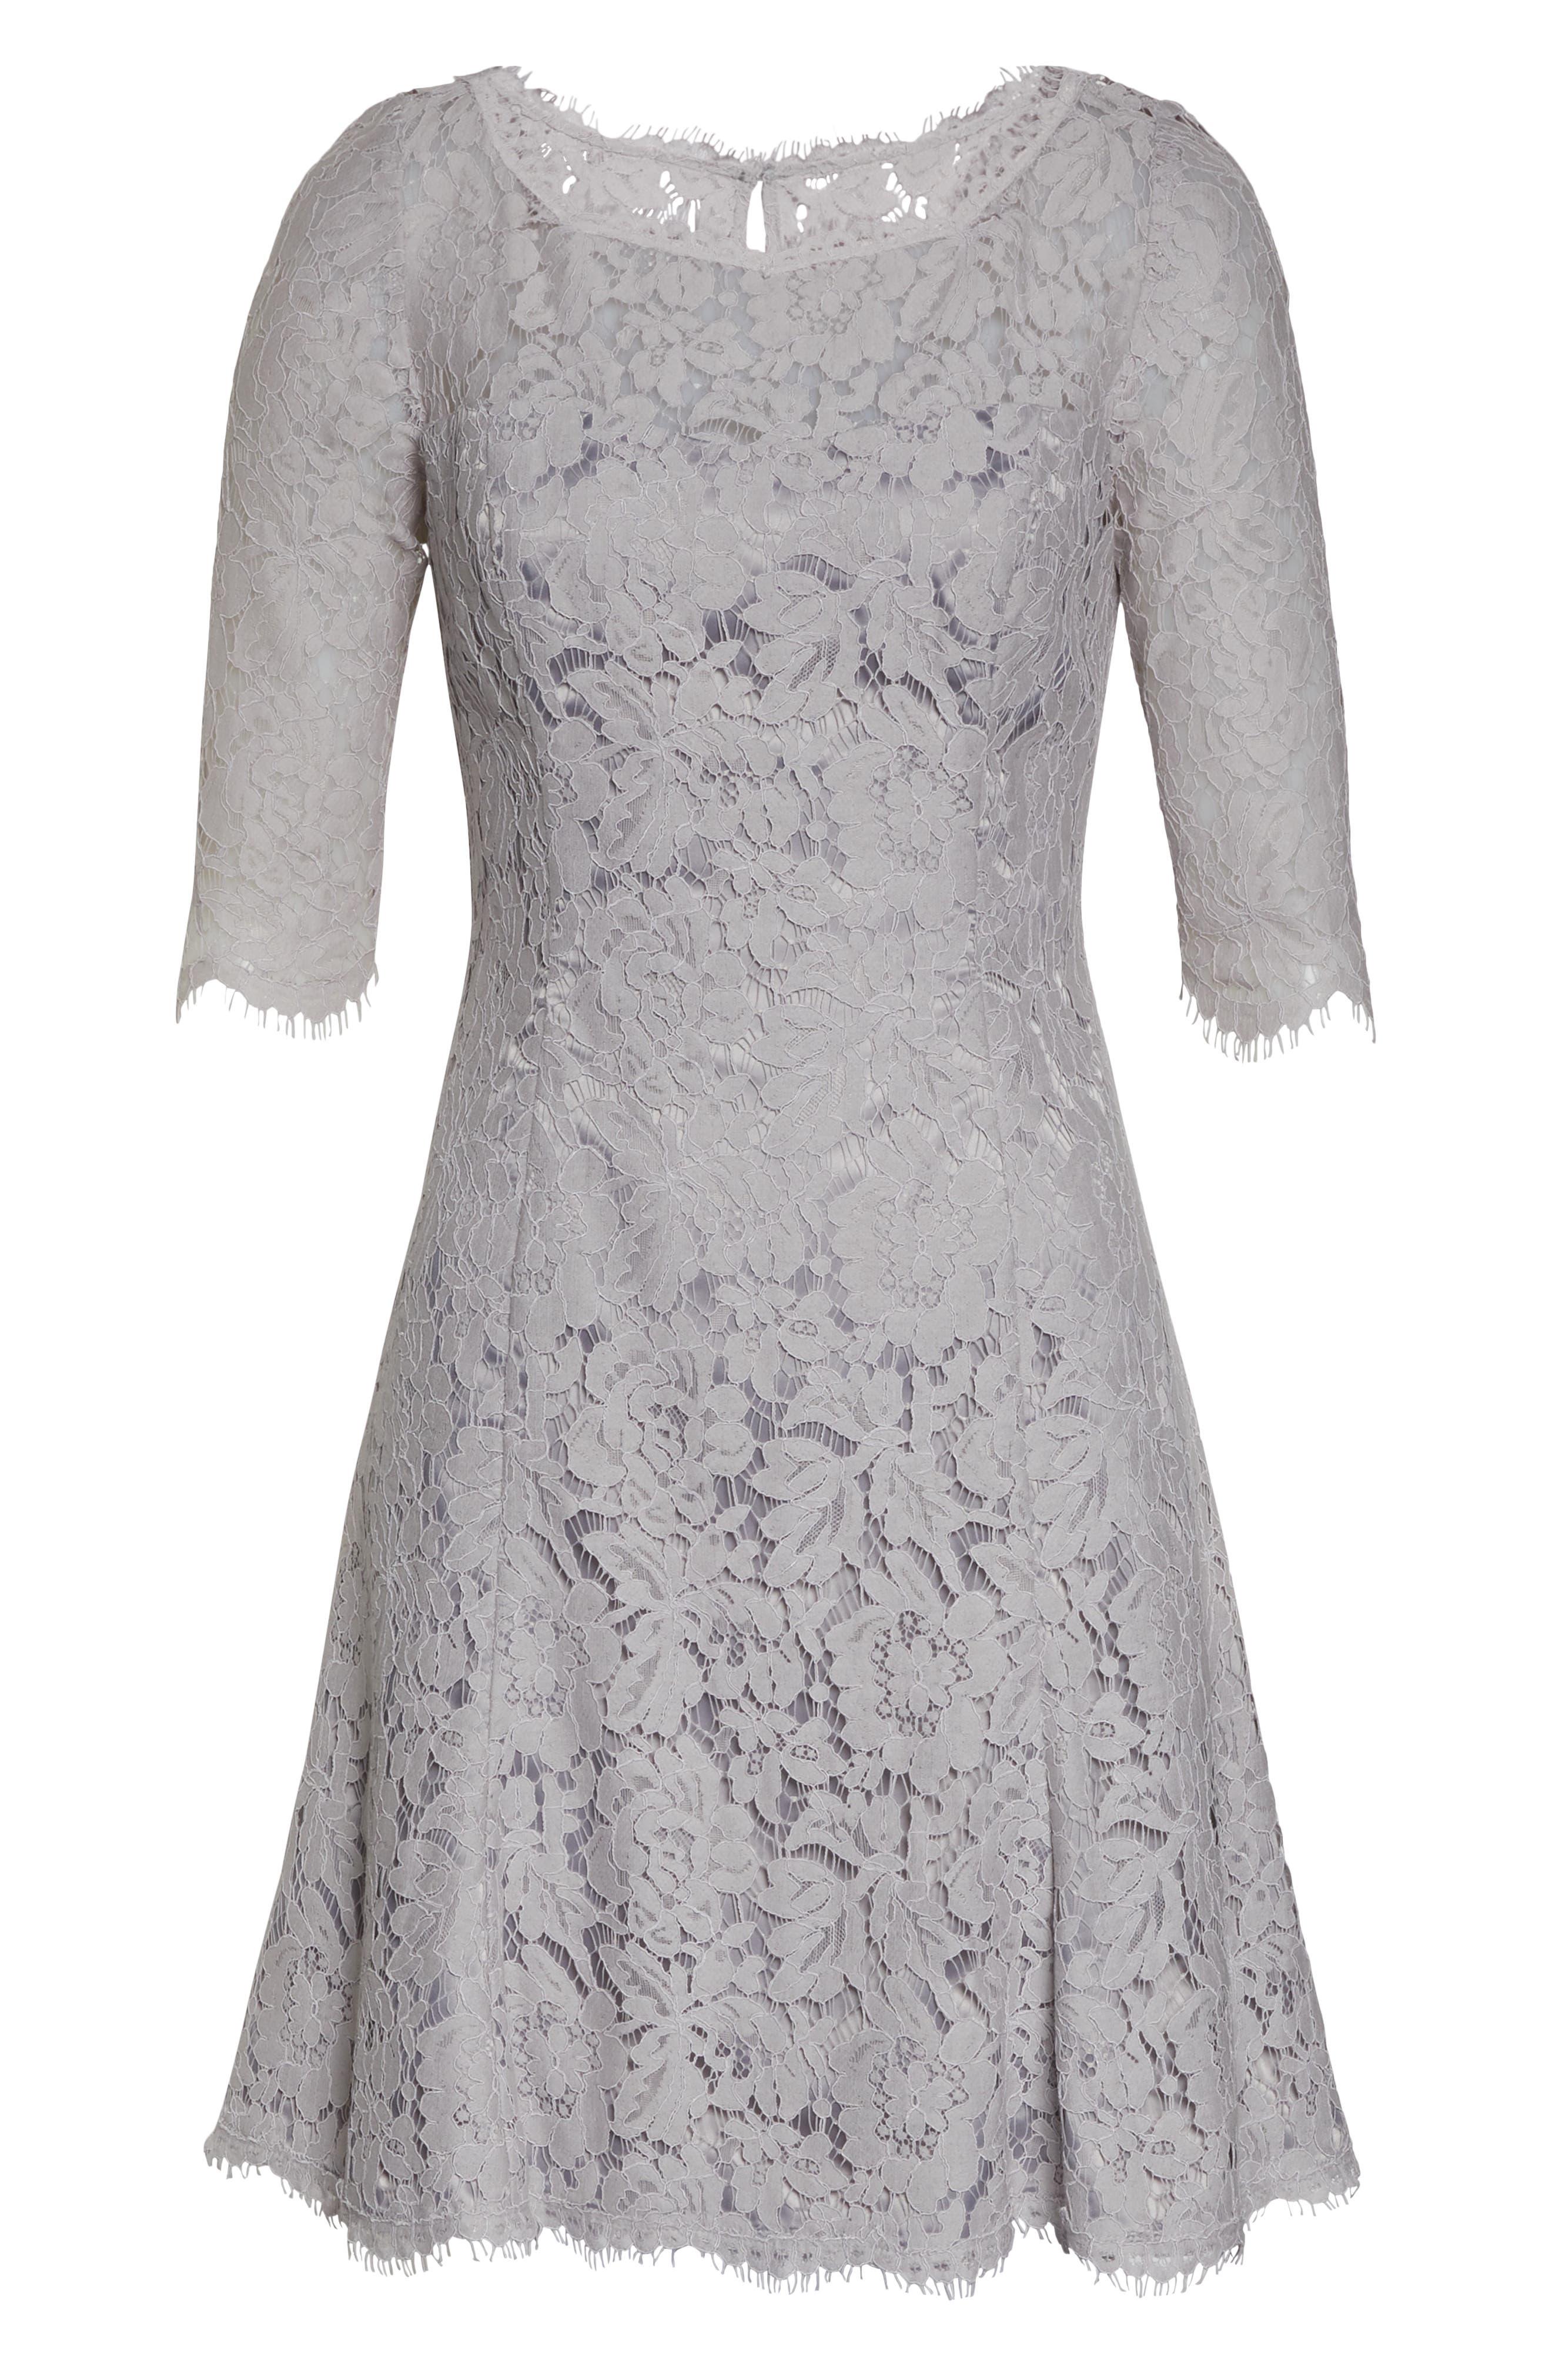 ELIZA J,                             Lace Fit & Flare Cocktail Dress,                             Alternate thumbnail 8, color,                             GREY